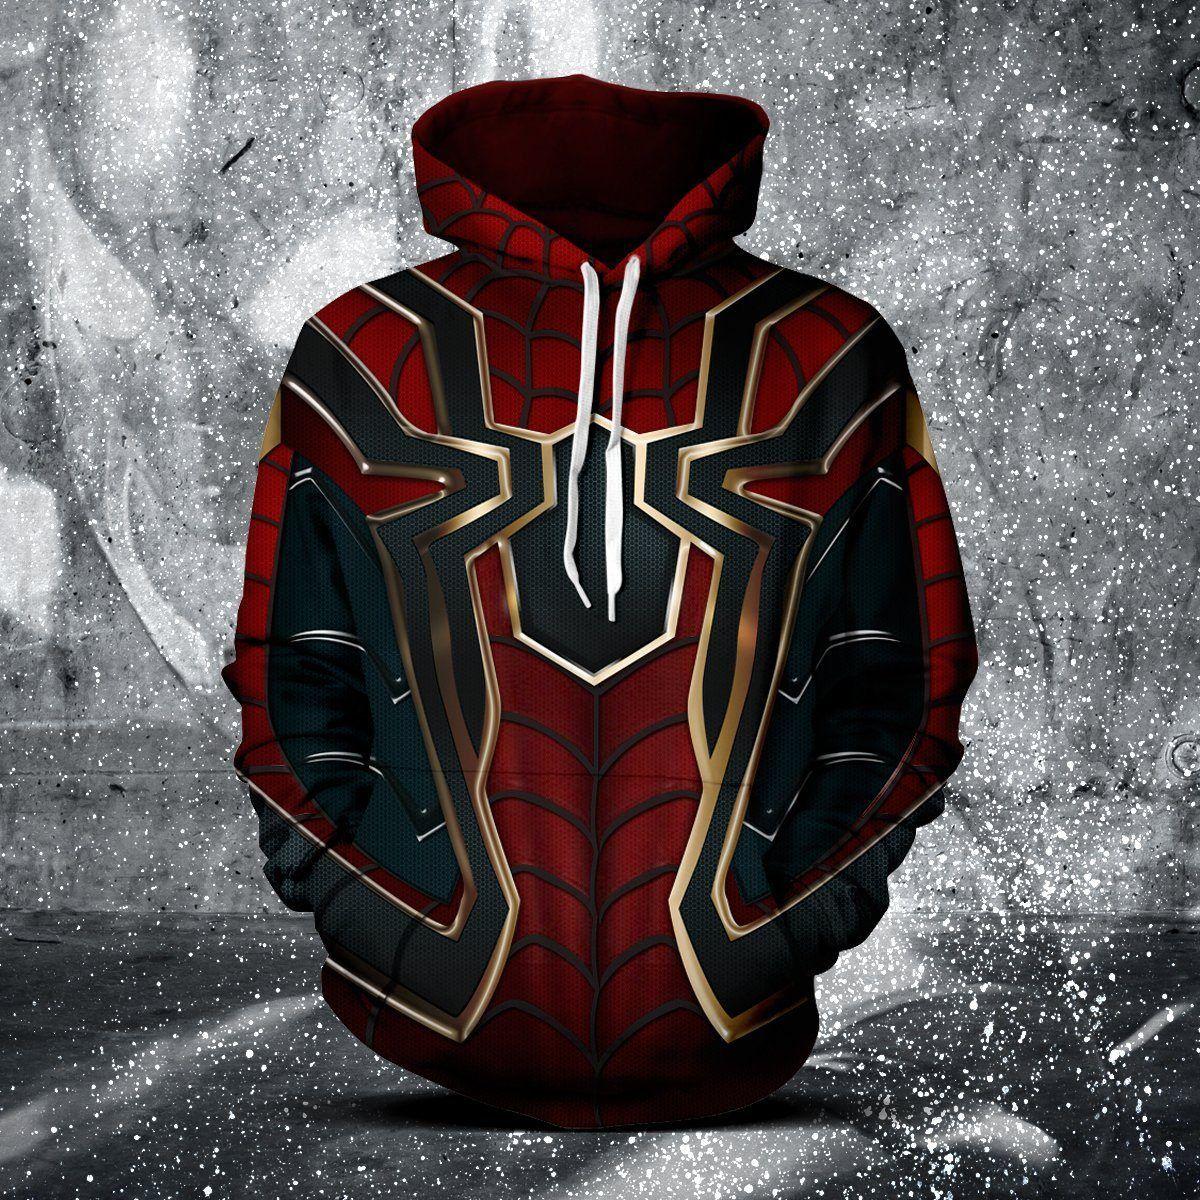 Spider Man Infinity War Unisex Hoodie Spiderman Hoodie Marvel Clothes Unisex Hoodies [ 1200 x 1200 Pixel ]